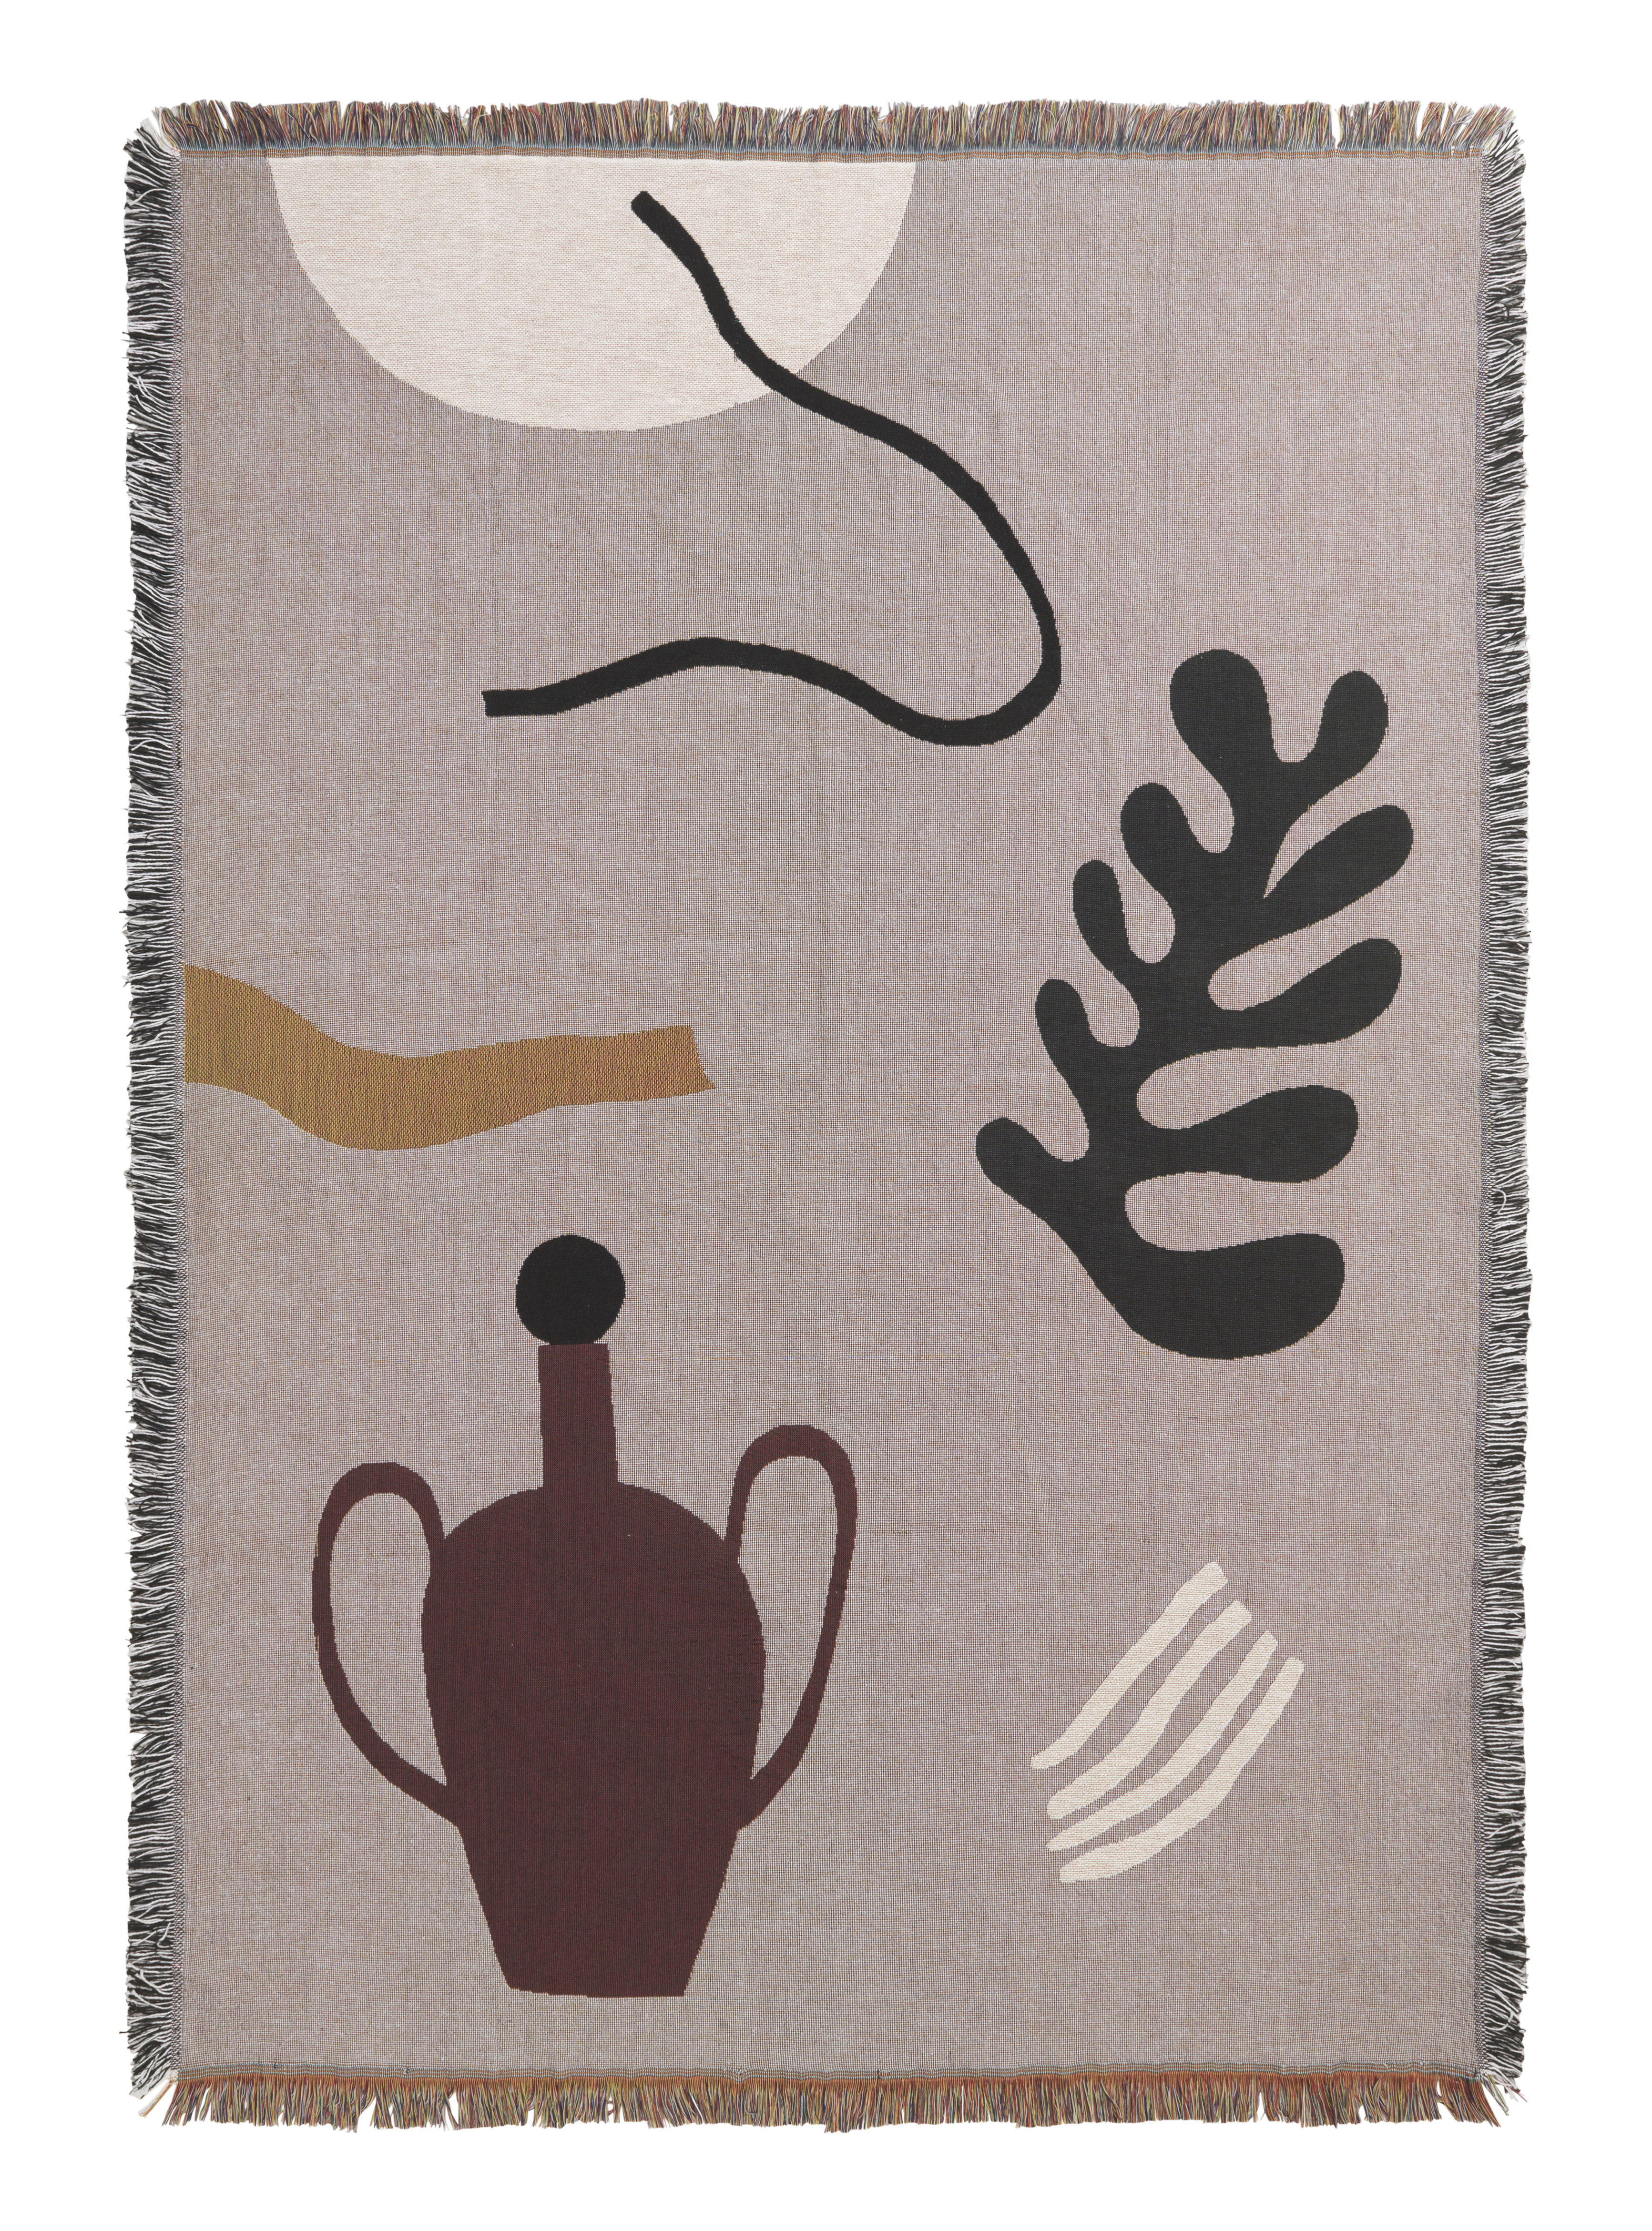 Dekoration - Wohntextilien - Mirage Plaid / 120 x 170 cm - Ferm Living - Grau / mehrfarbig - Baumwolle